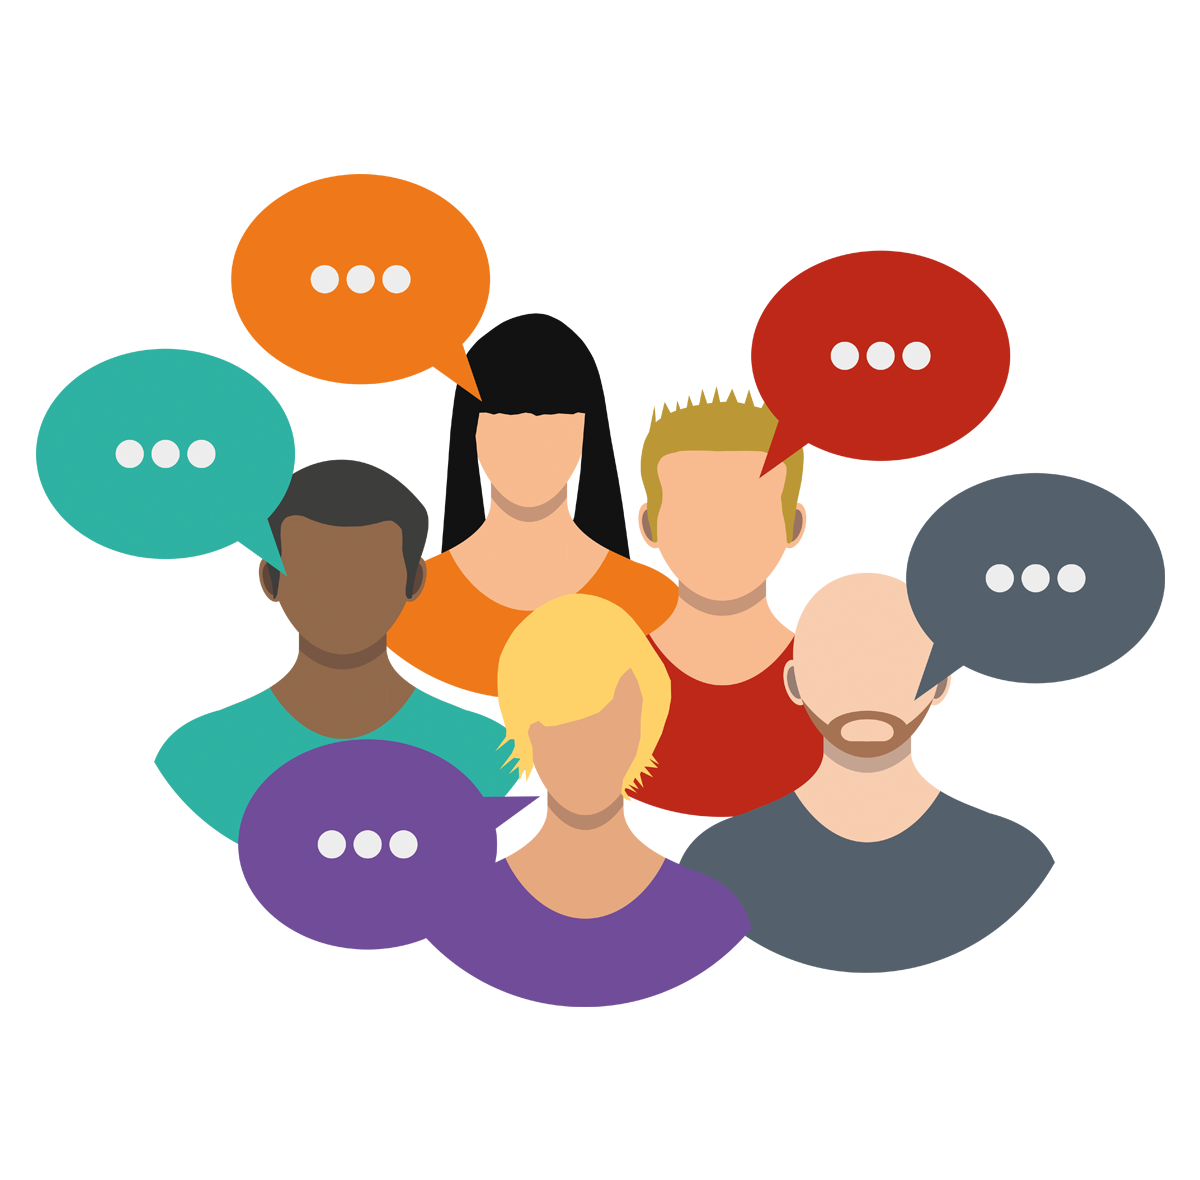 Research net patient foundation. Community clipart social involvement